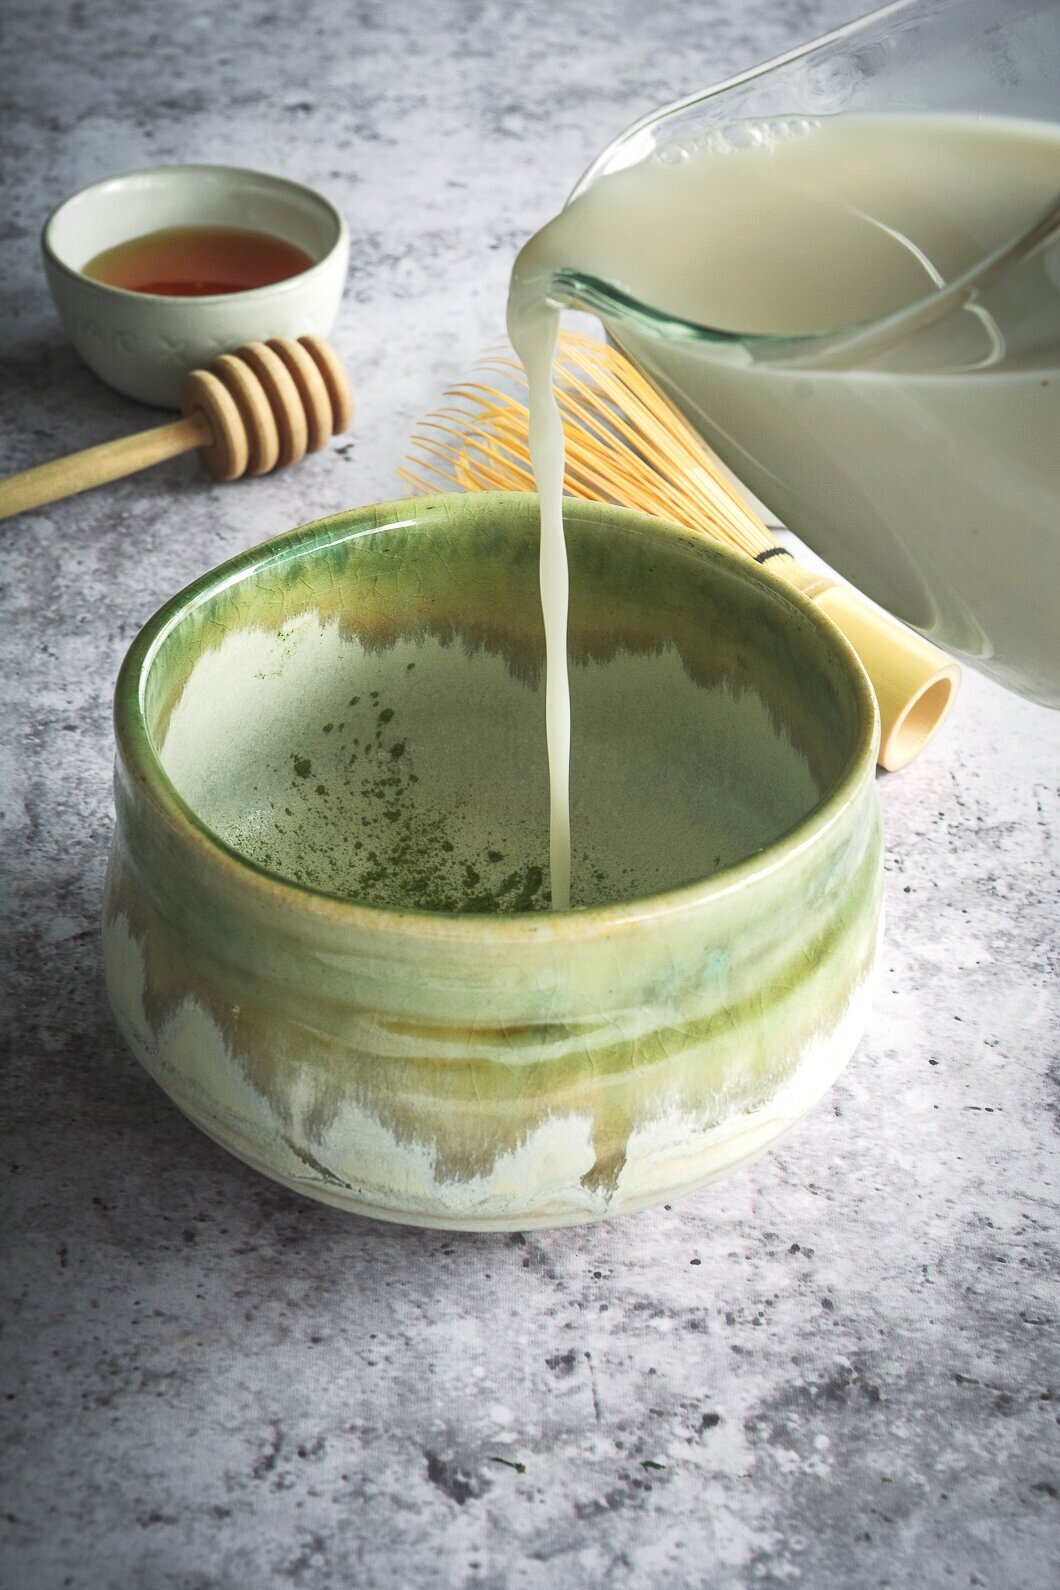 Pouring almond milk into mug